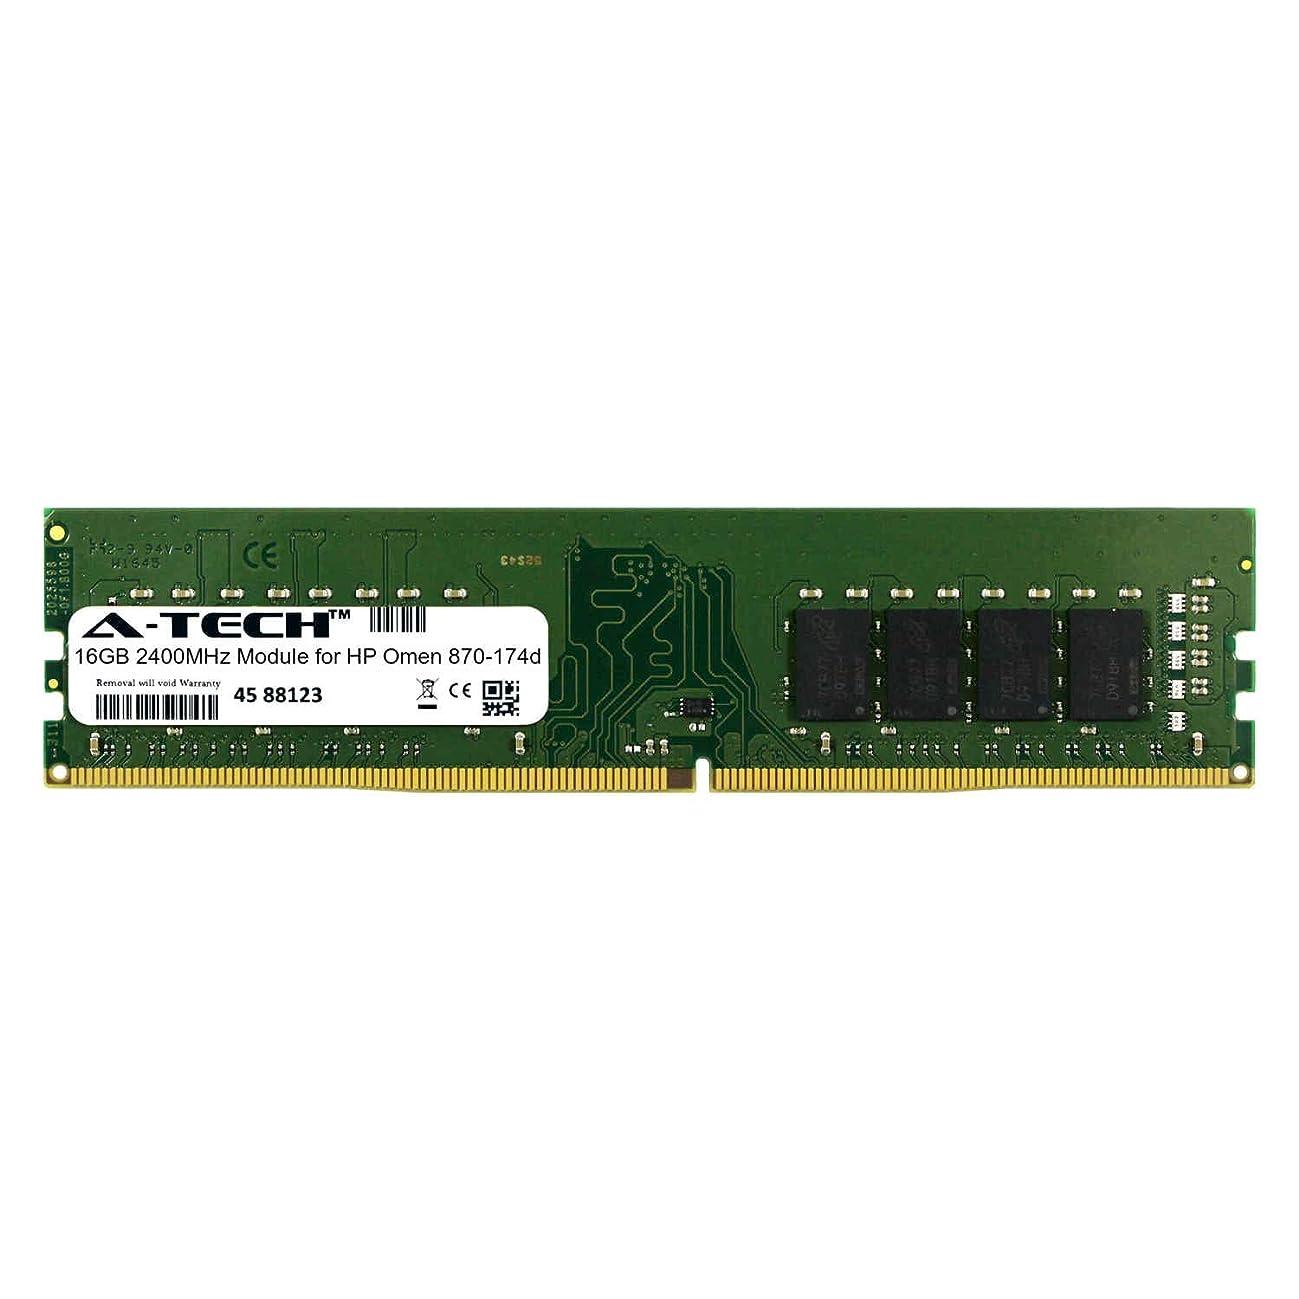 A-Tech 16GB Module for HP Omen 870-174d Desktop & Workstation Motherboard Compatible DDR4 2400Mhz Memory Ram (ATMS282195A25822X1)